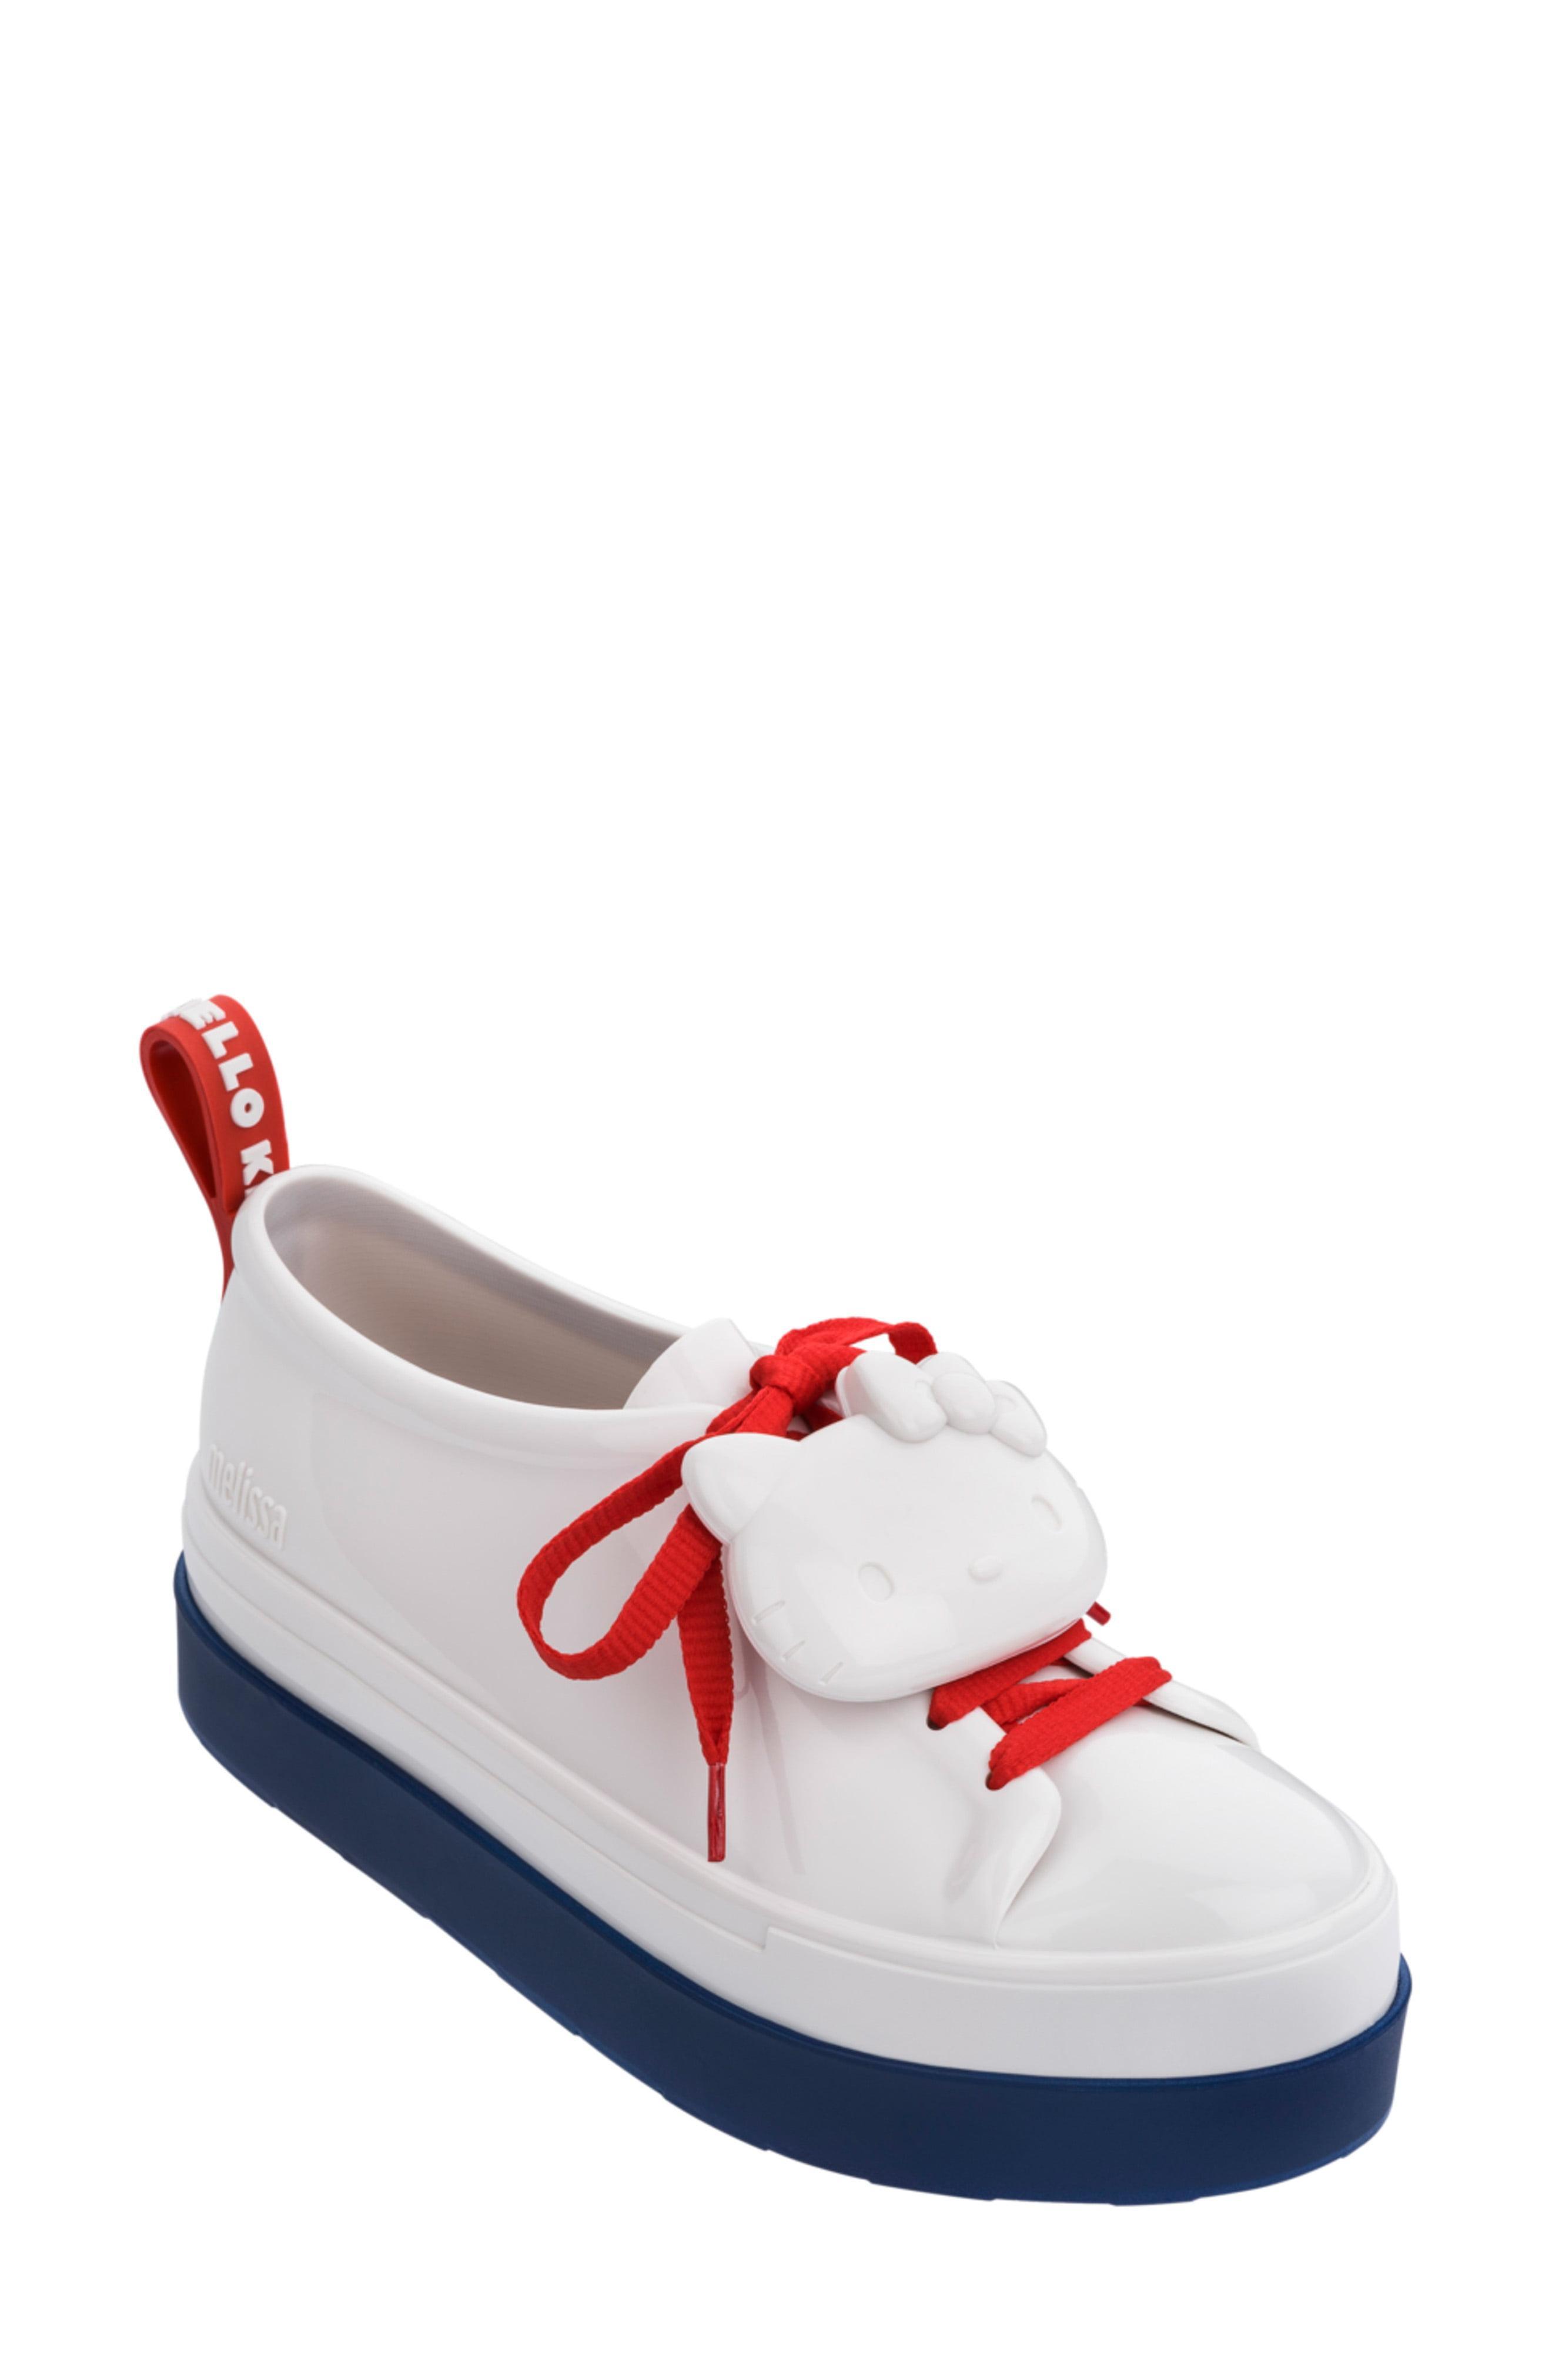 d9c7d0bb6 Melissa - Red Hello Kitty Sneaker - Lyst. View fullscreen